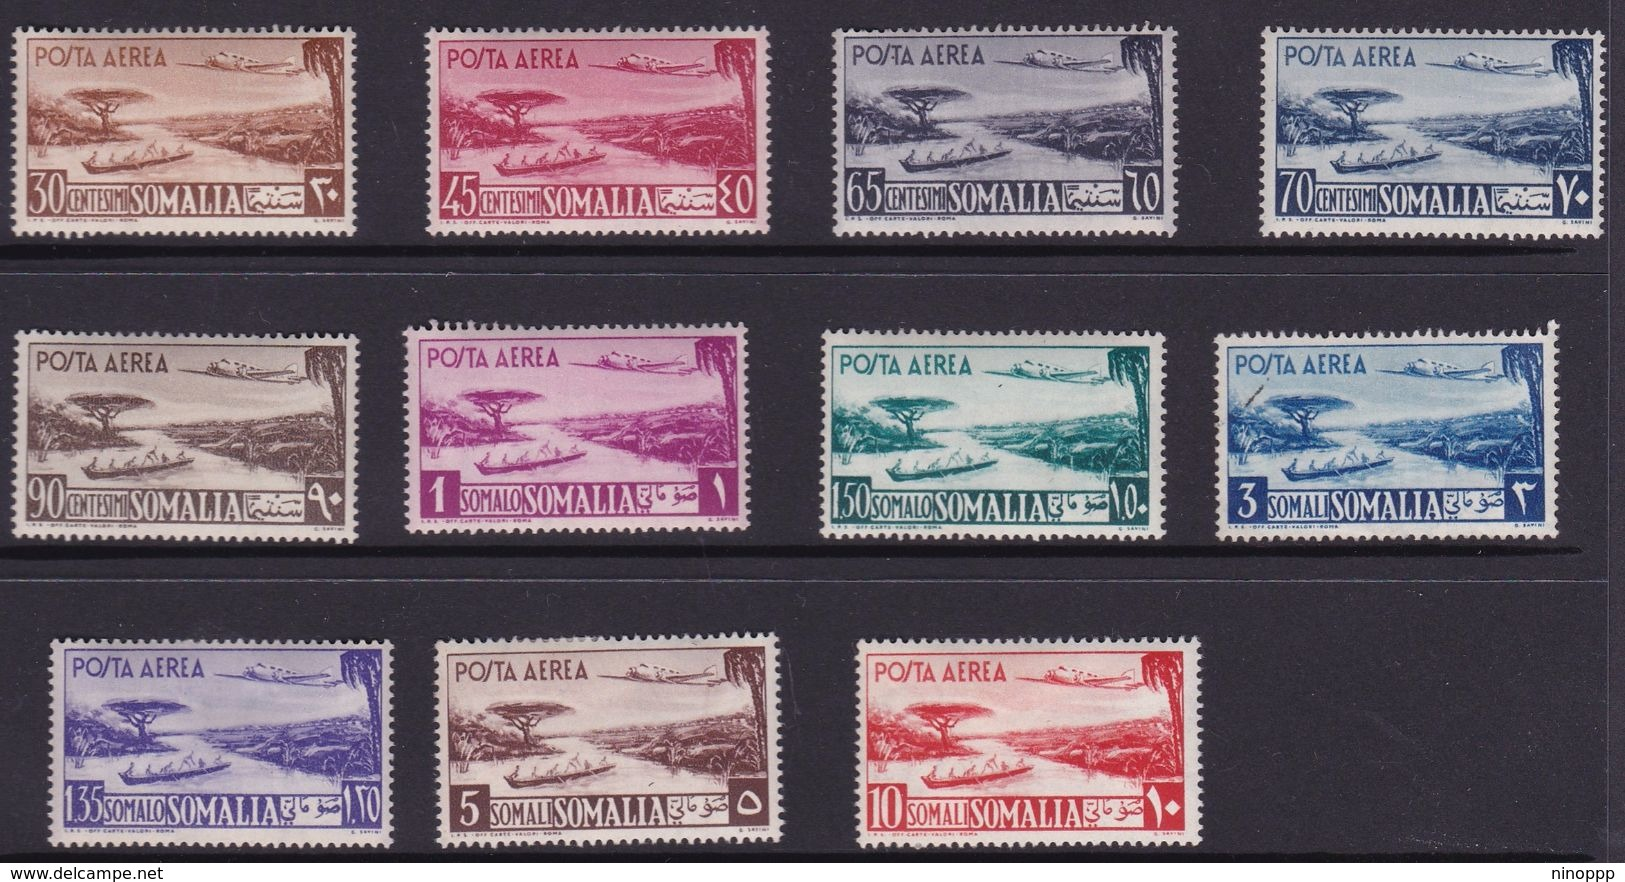 Somalia Scott C17-27 1950 Air Post Definitives, Mint Hinged - Somalie (AFIS)